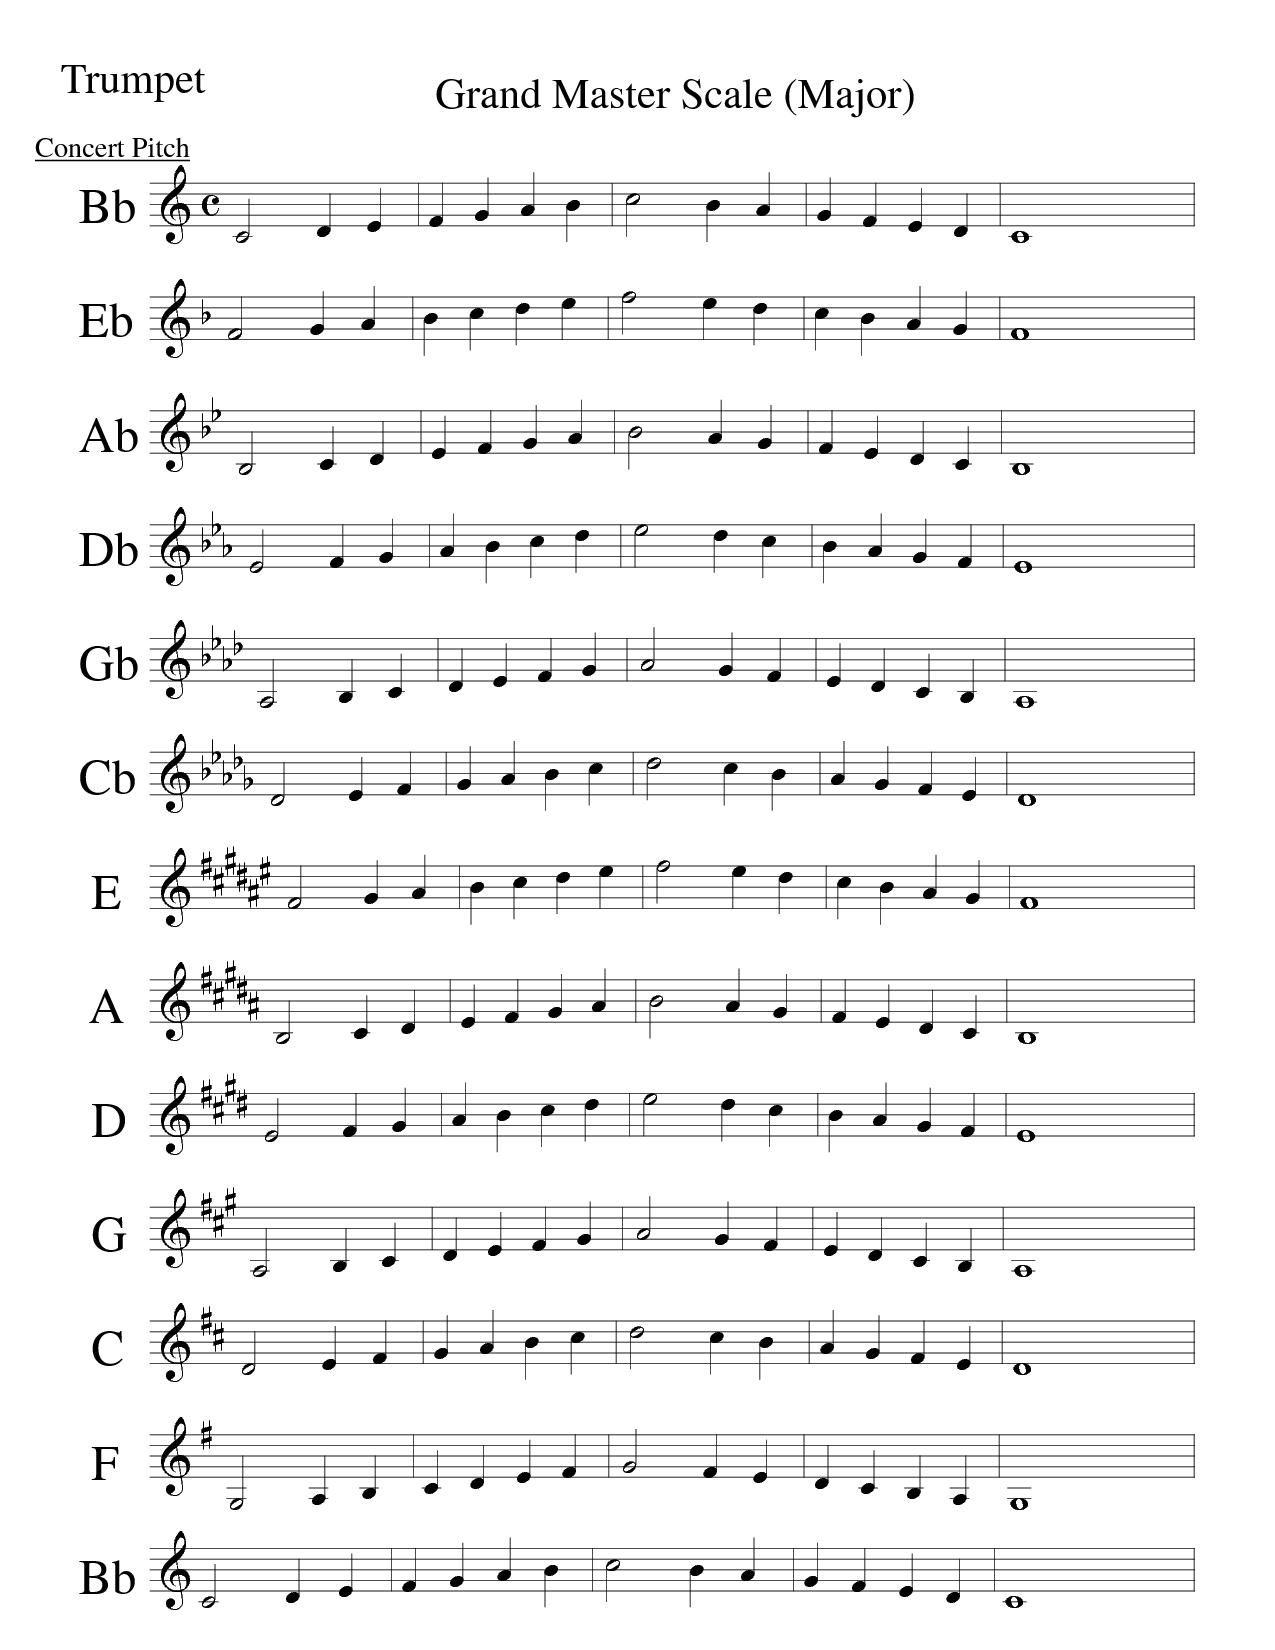 B Flat Clarinet Scales Finger Chart Trumpet Major Scales i...